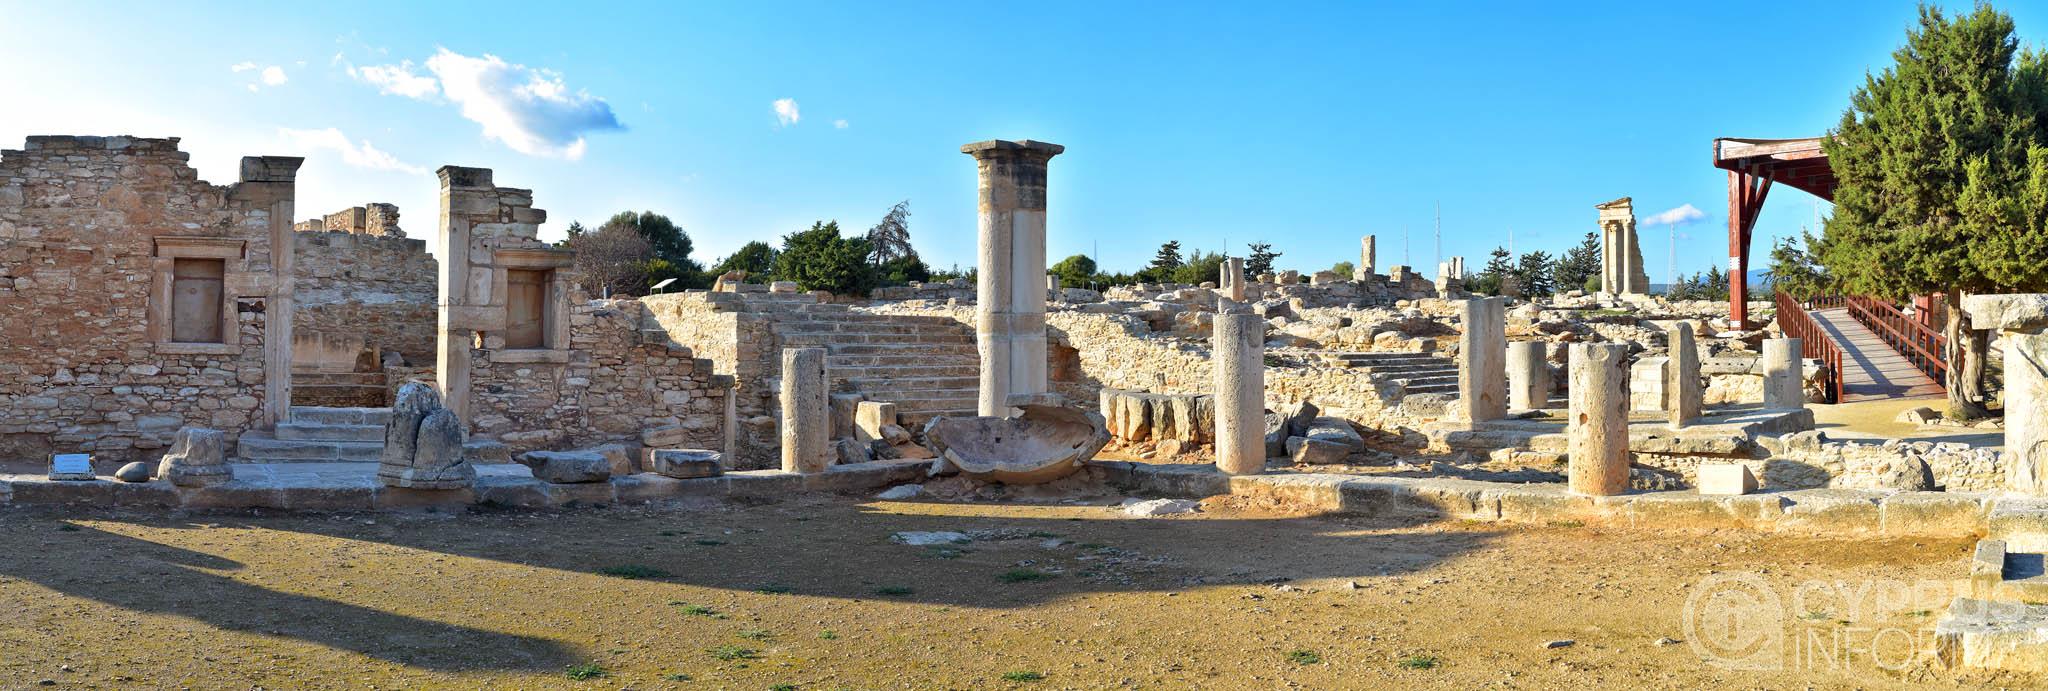 Temple Of Apollo Hylates  Online Journal Cyprus Inform